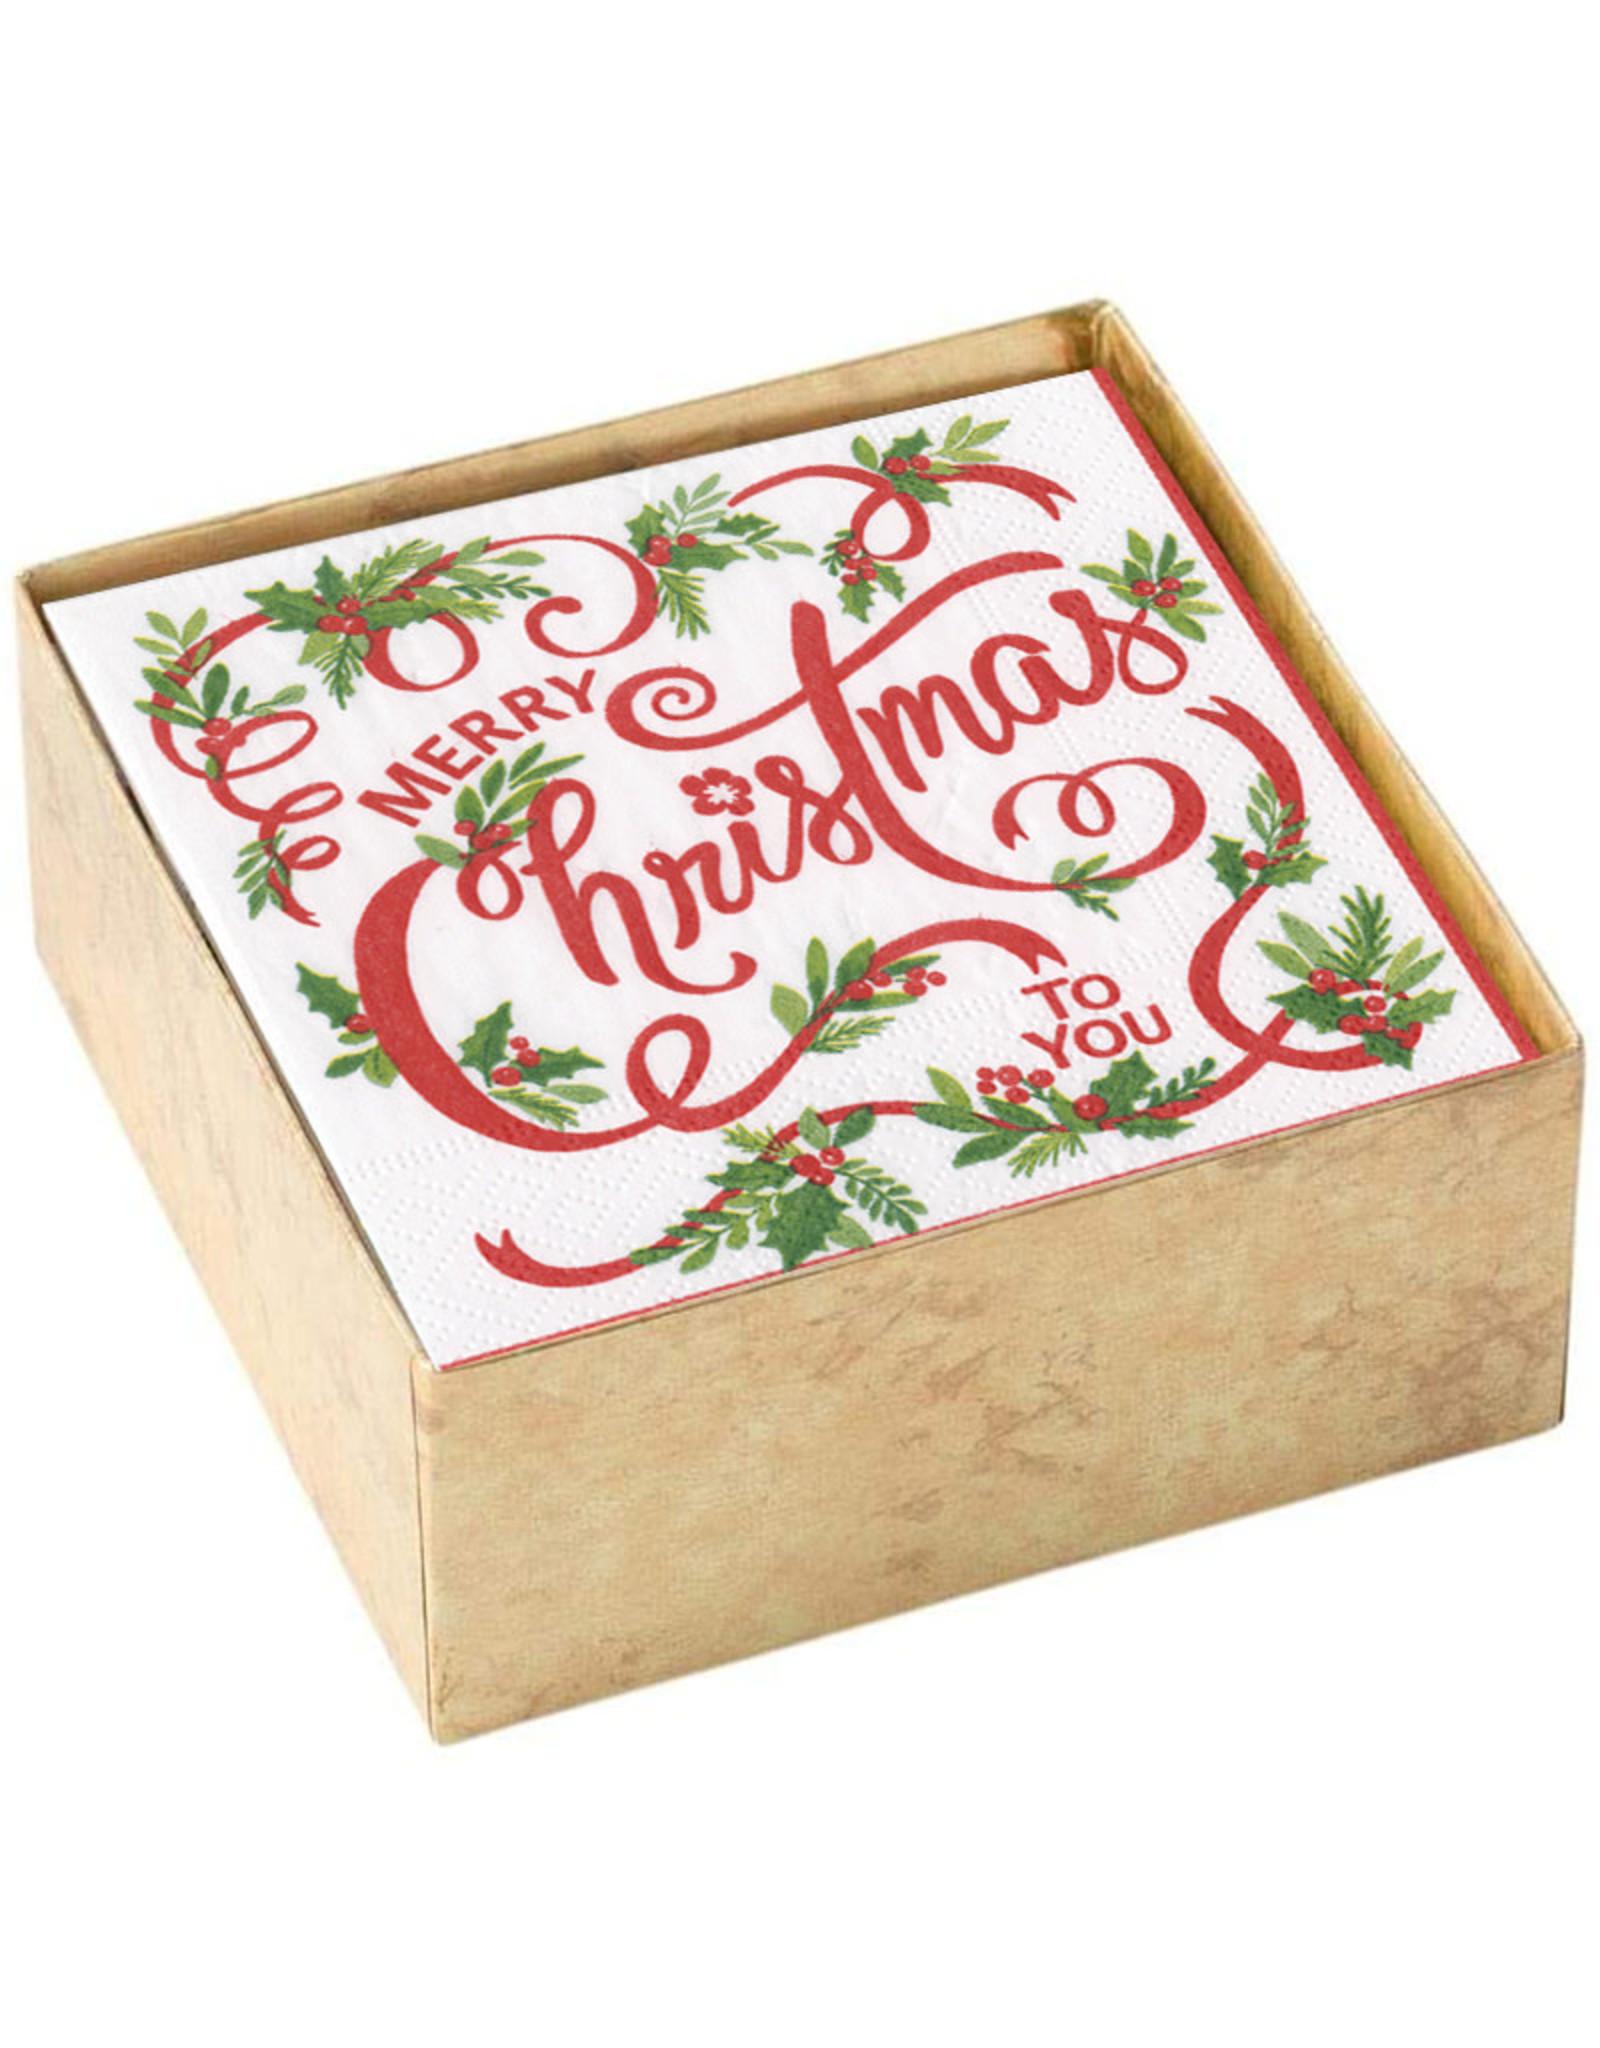 Caspari Boxed Christmas Paper Cocktail Napkins 40pk Merry Christmas To You